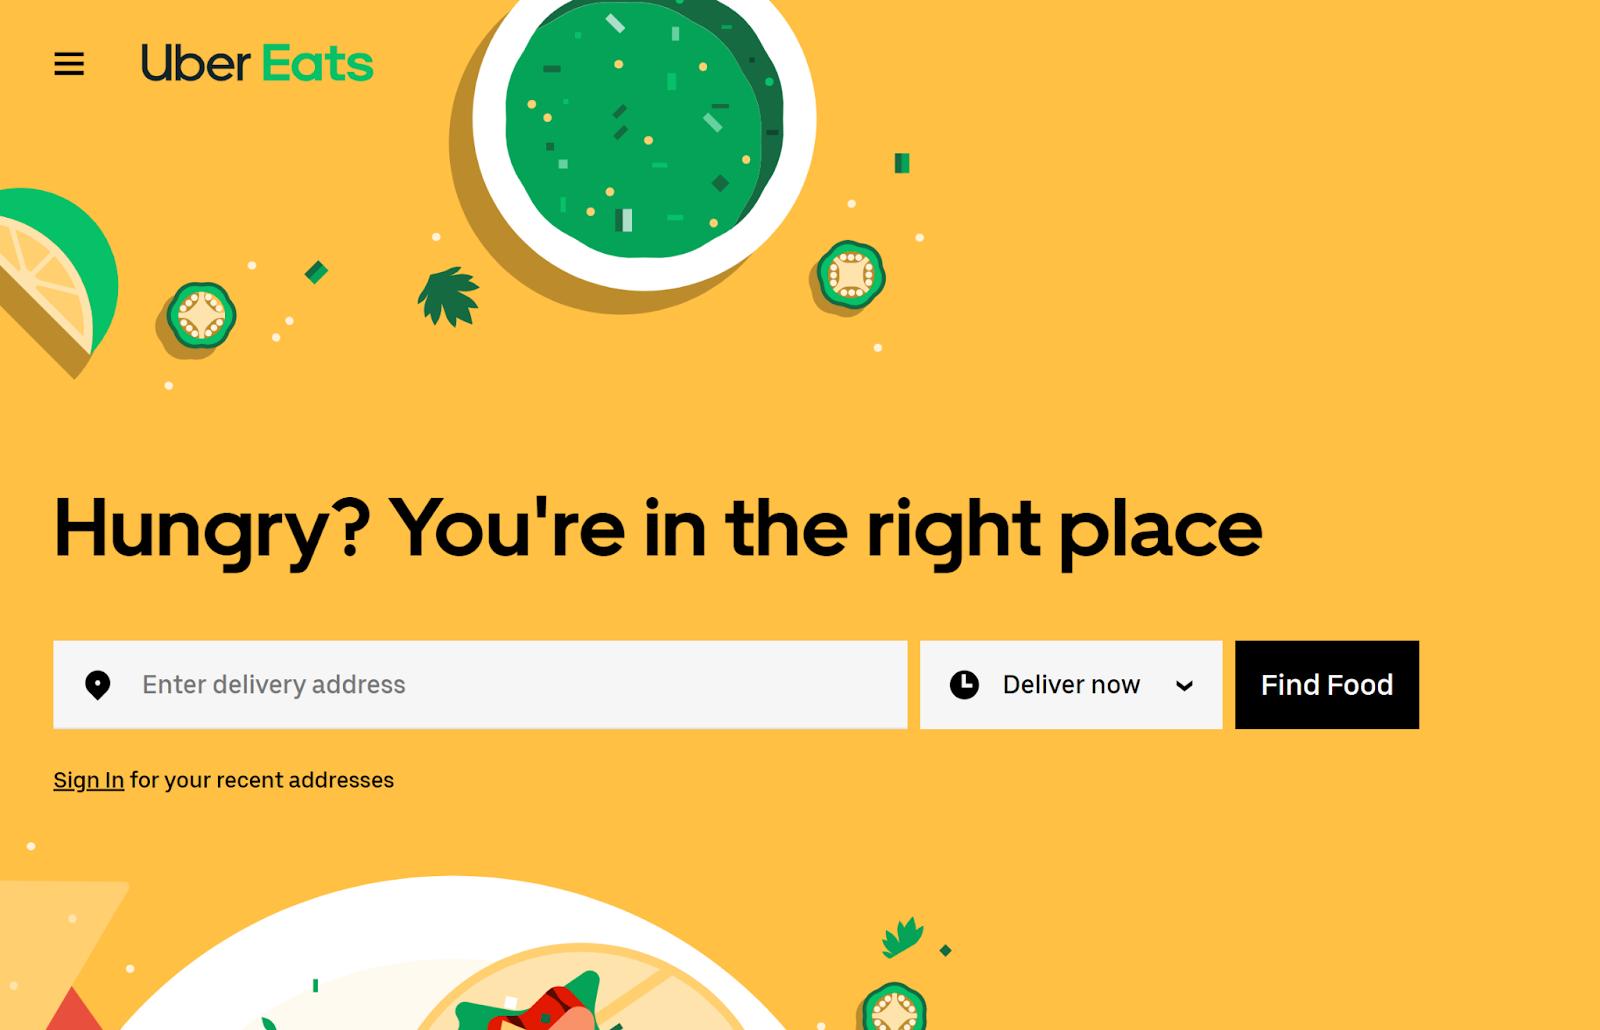 Uber Eats email marketing landing page